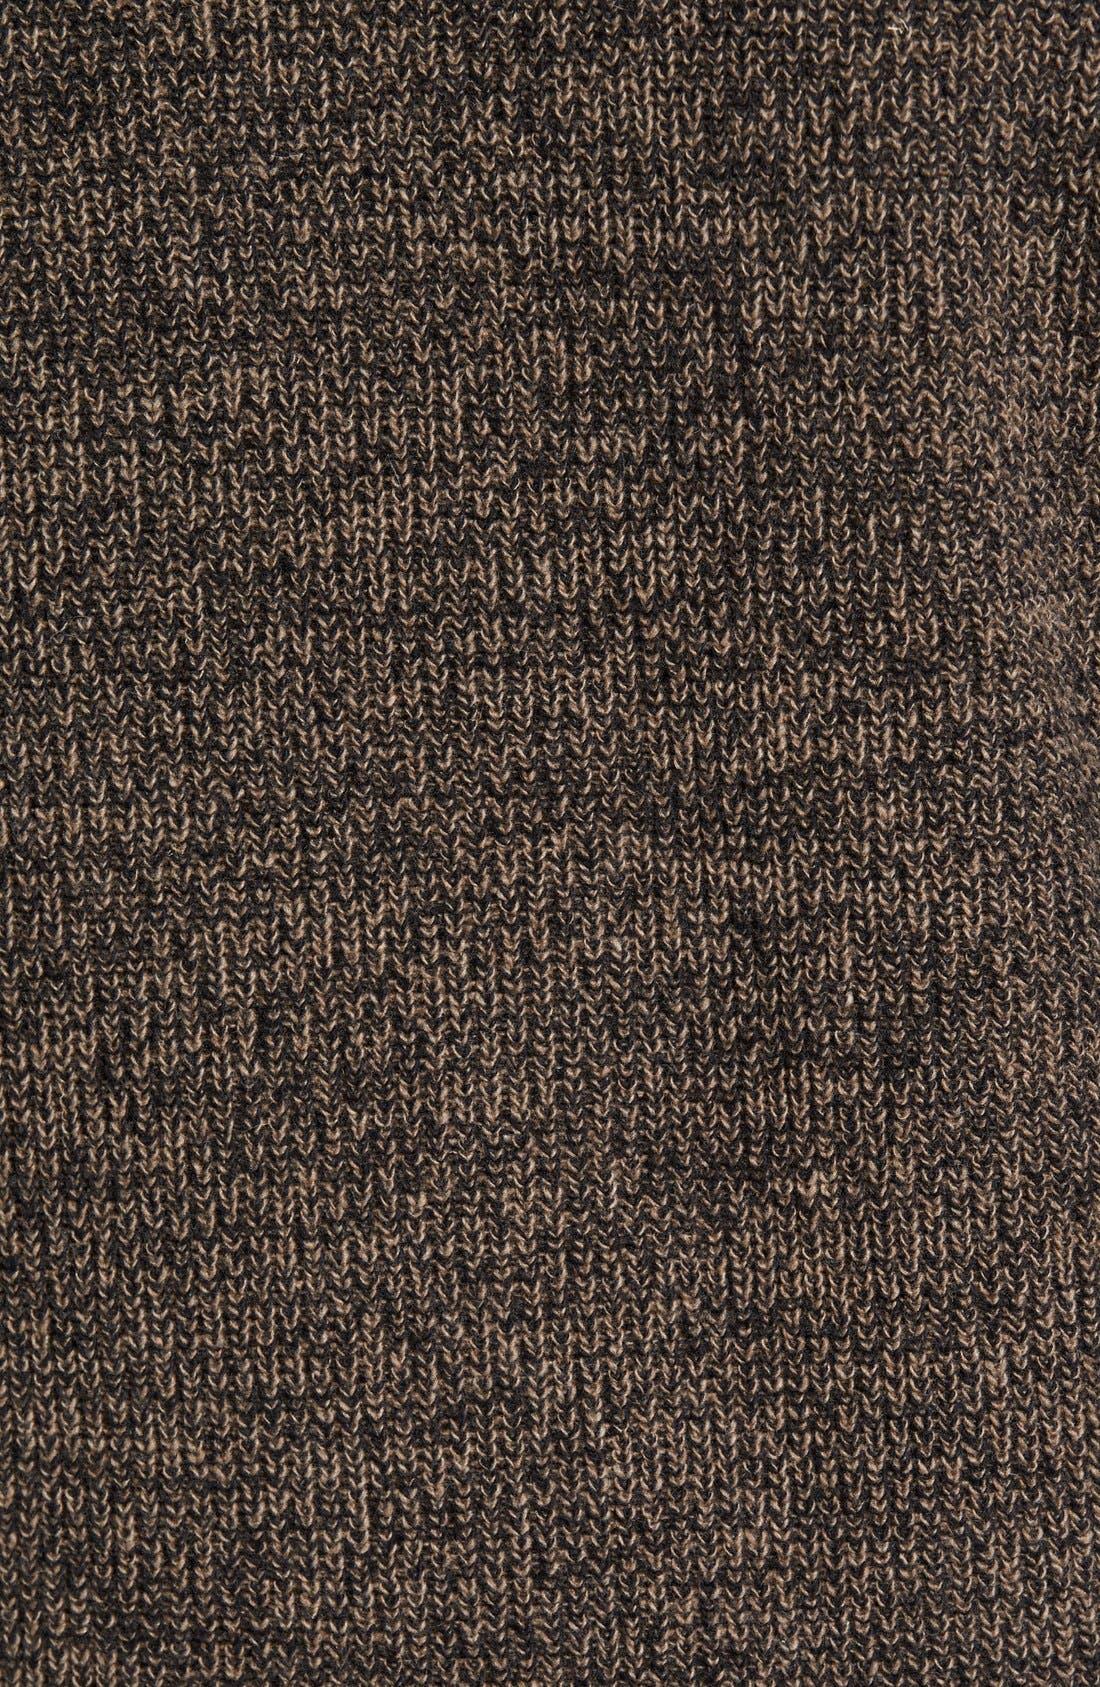 'Woodglen' Herringbone Knit Lambswool Quarter Zip Sweater,                             Alternate thumbnail 5, color,                             Walnut